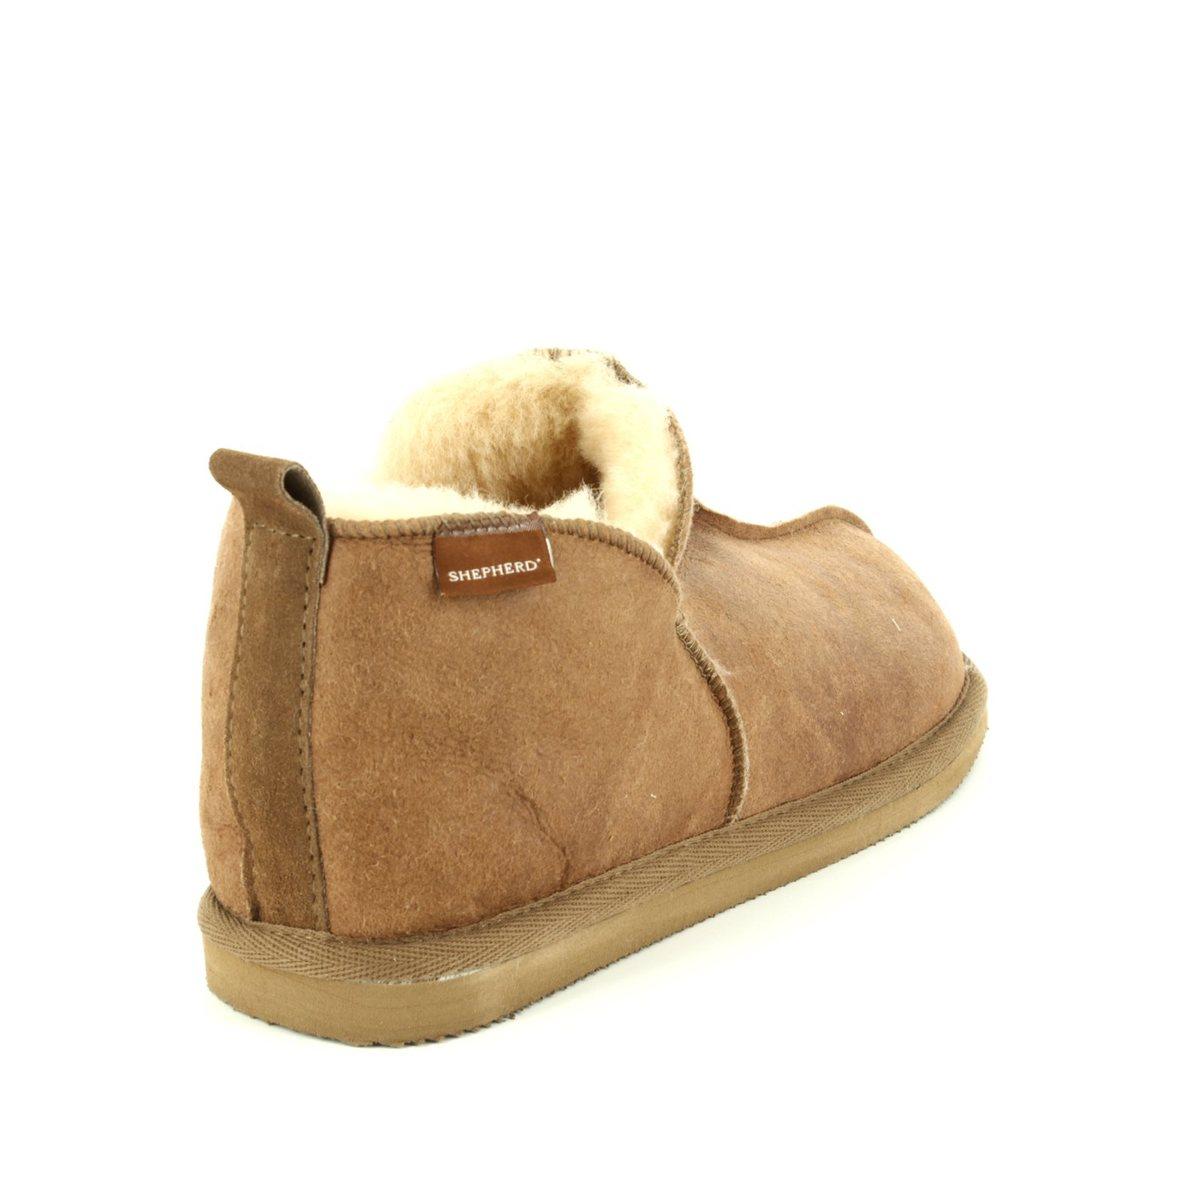 57d8bea3e2e2 Shepherd of Sweden Slippers - Tan Leather - 492252 ANNIE